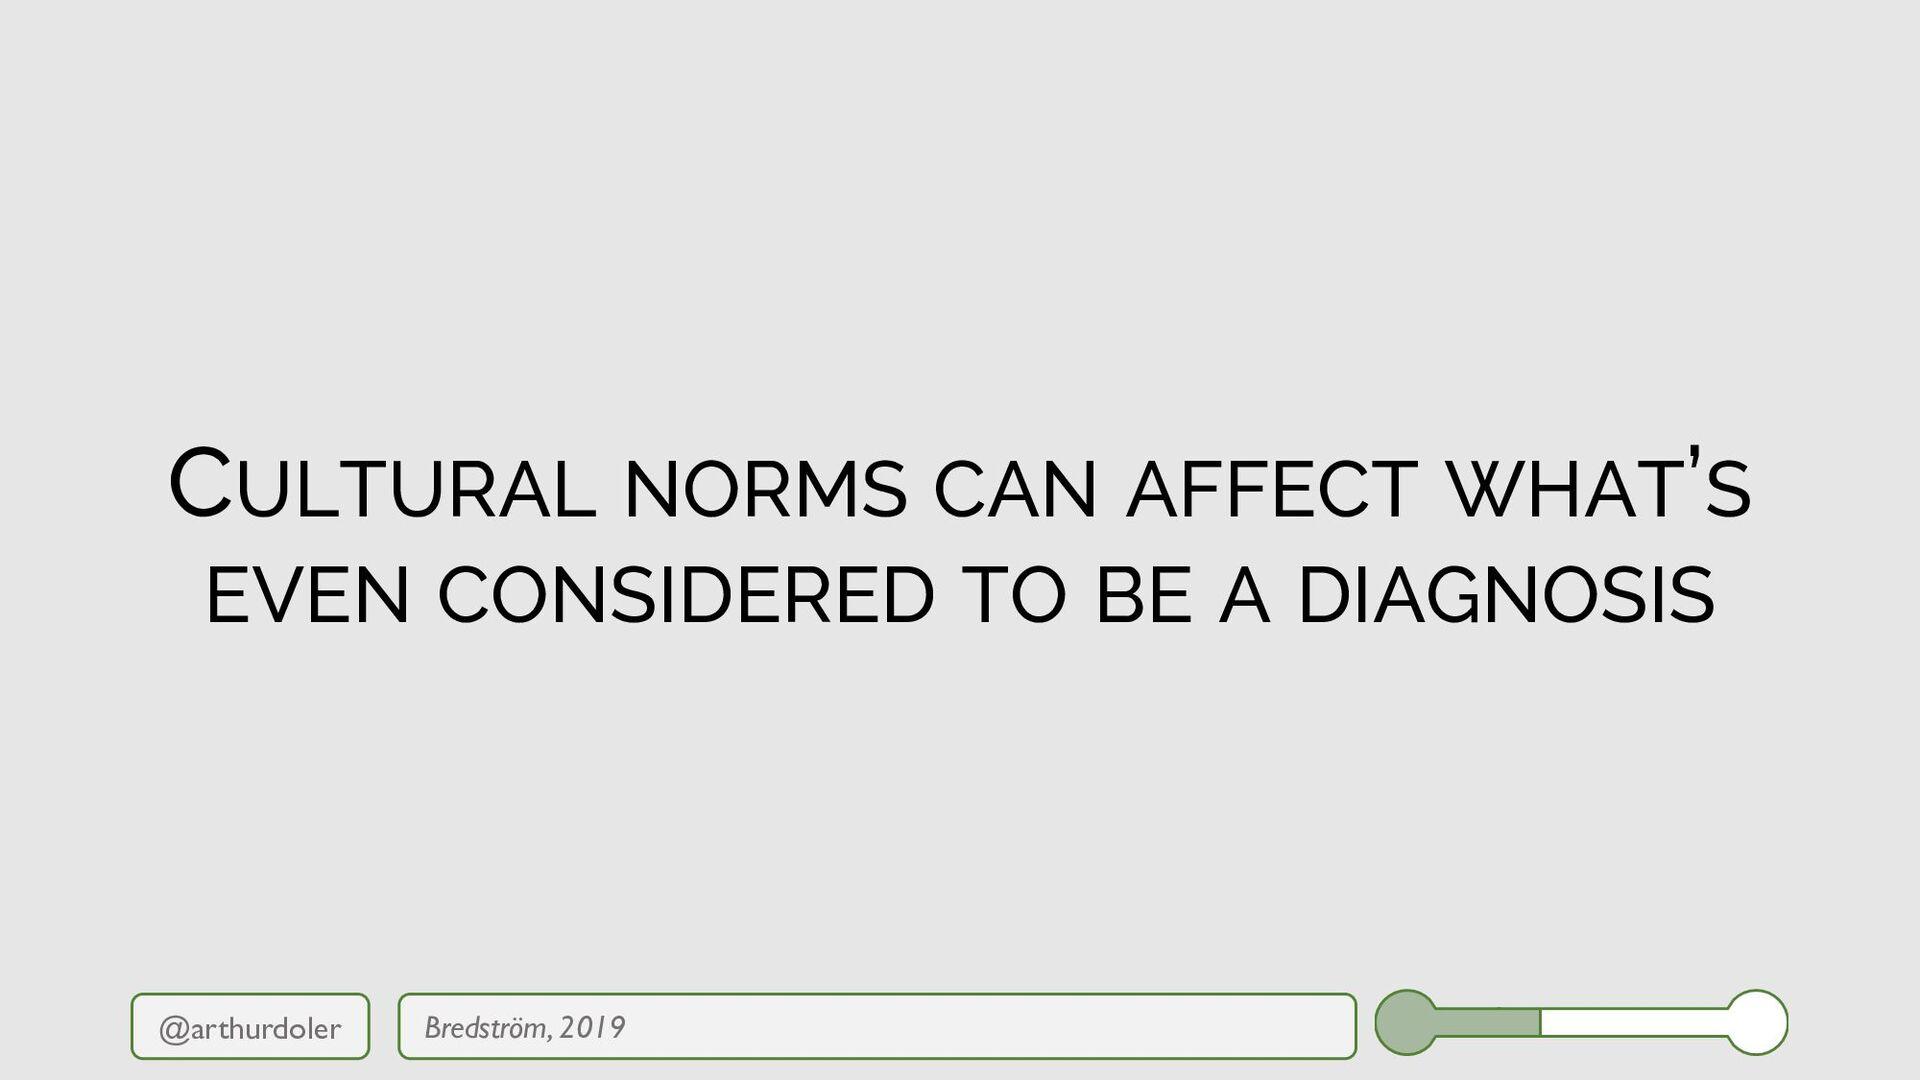 @arthurdoler CULTURAL NORMS CAN AFFECT WHAT'S E...